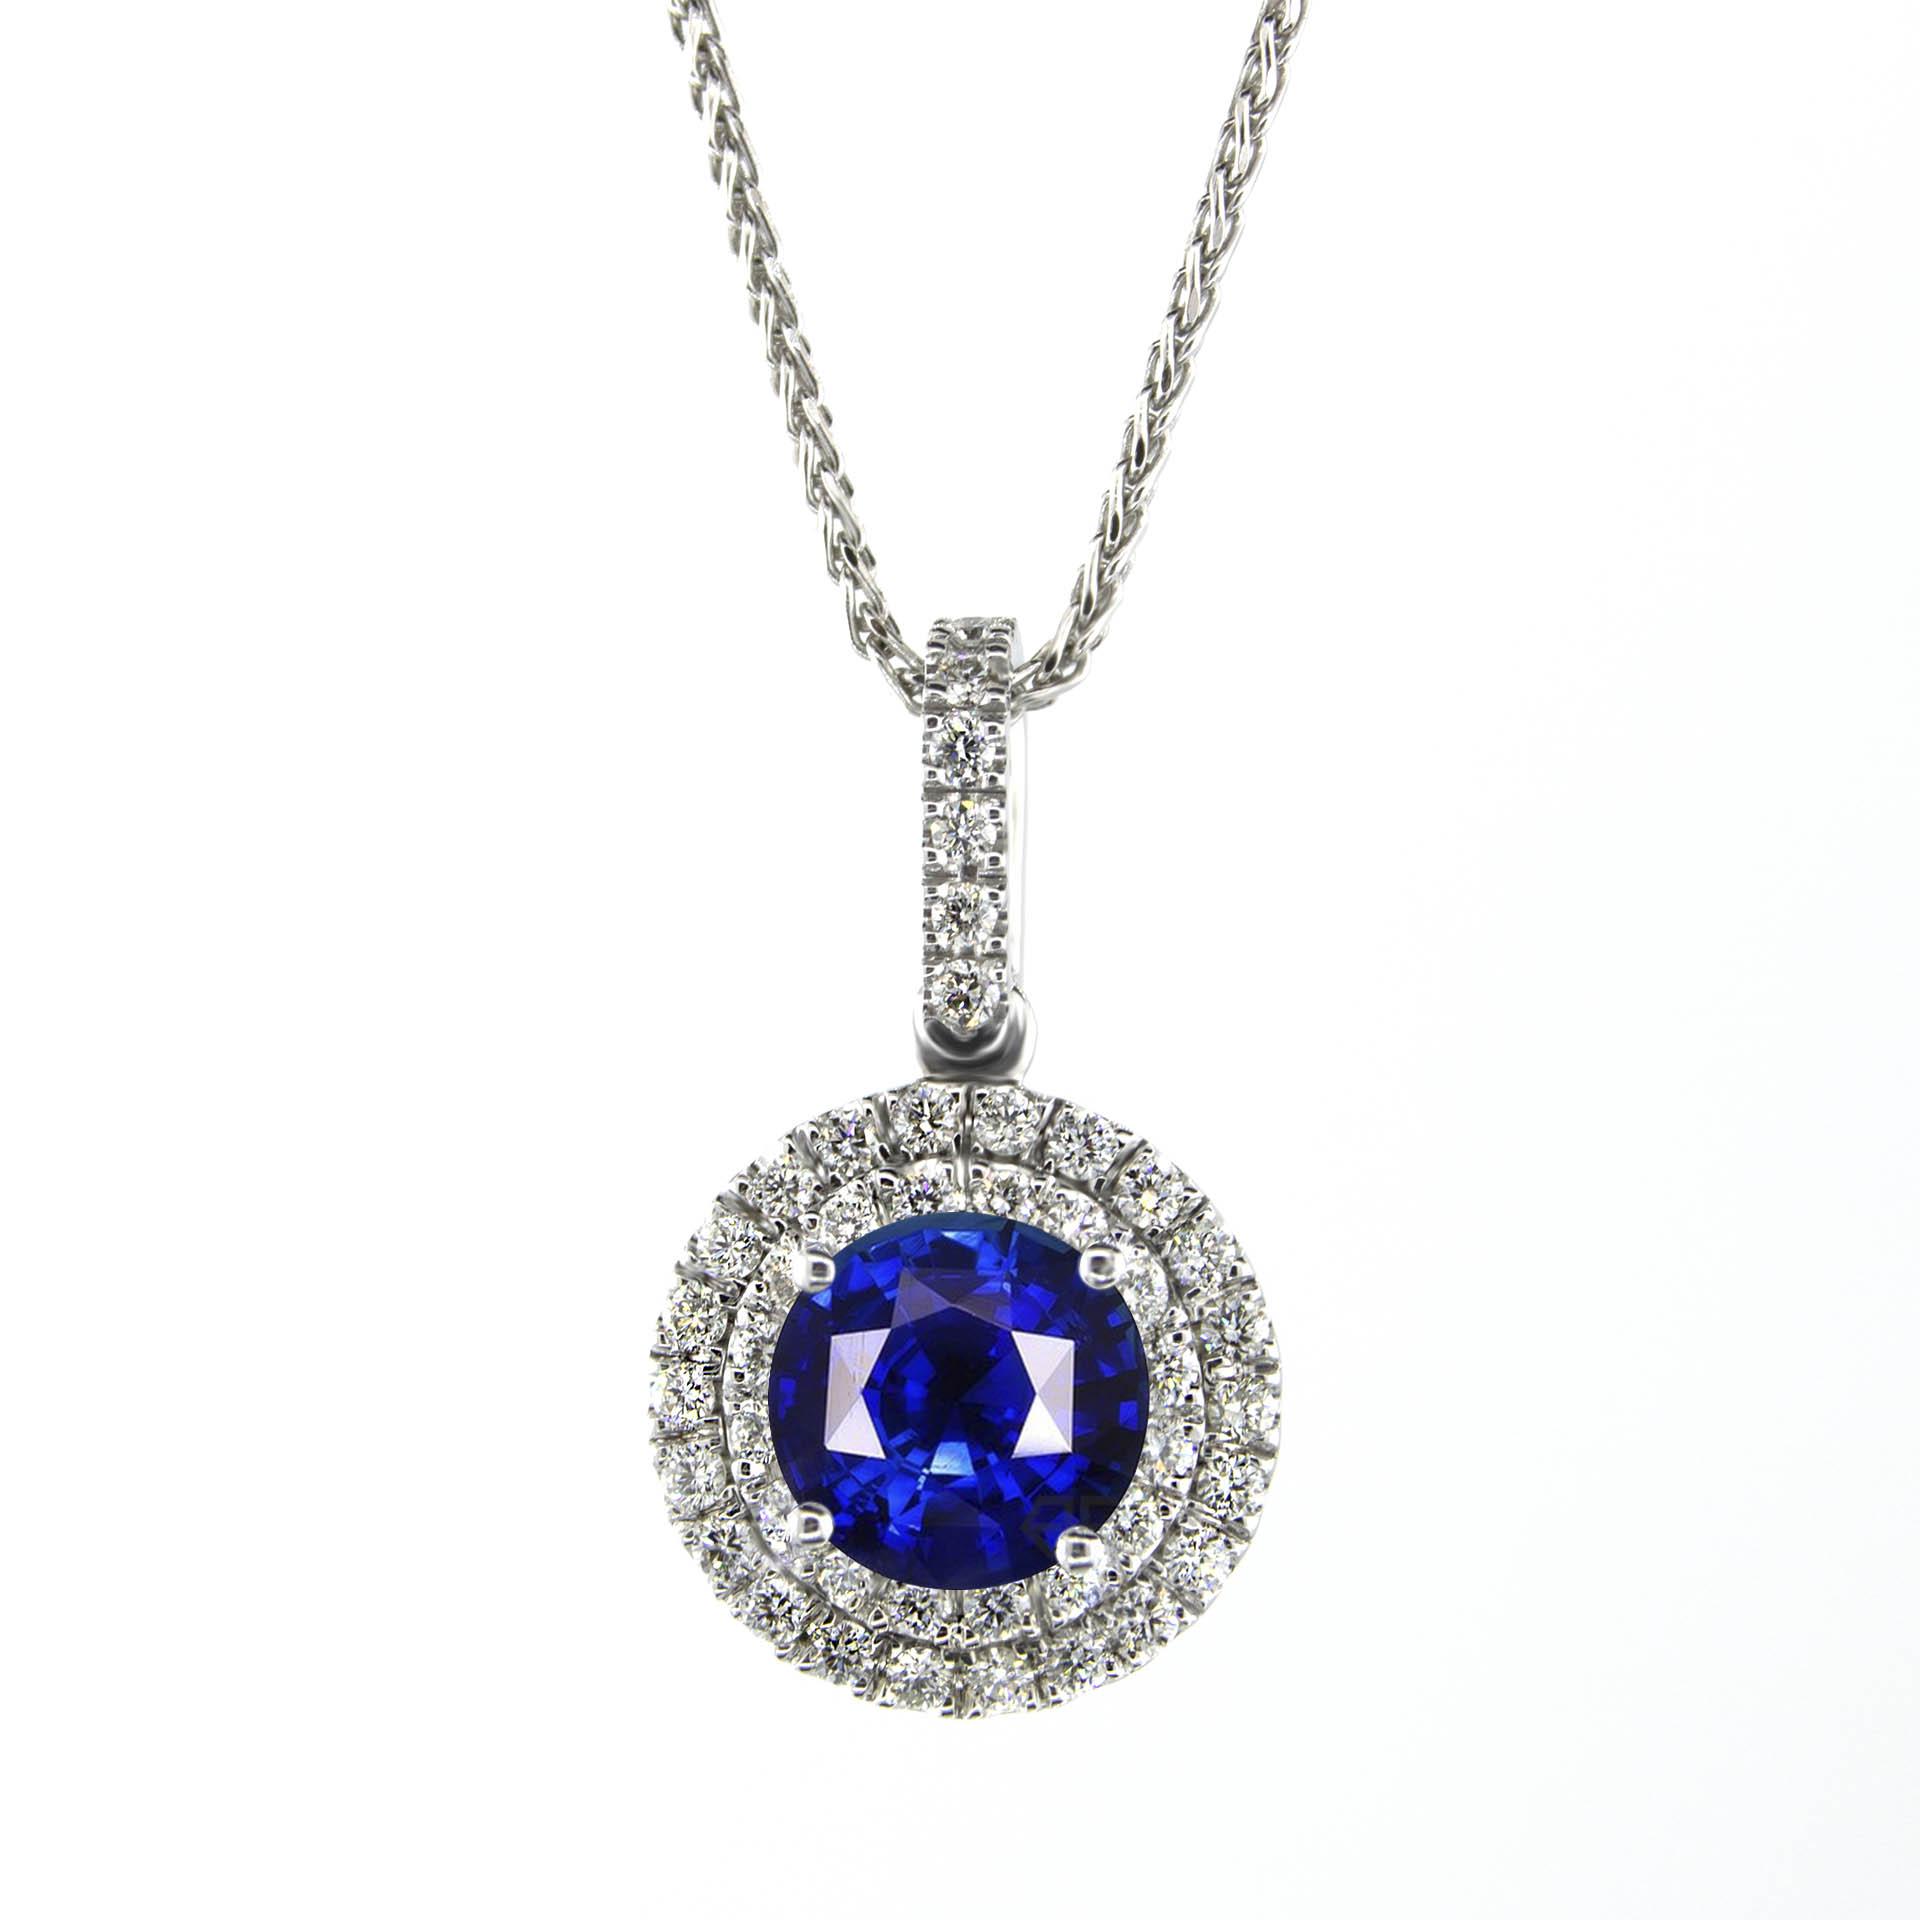 eca182198c19f 1.60 Carat Blue Sapphire Halo Necklace Pendant , Gold or Platinum ...